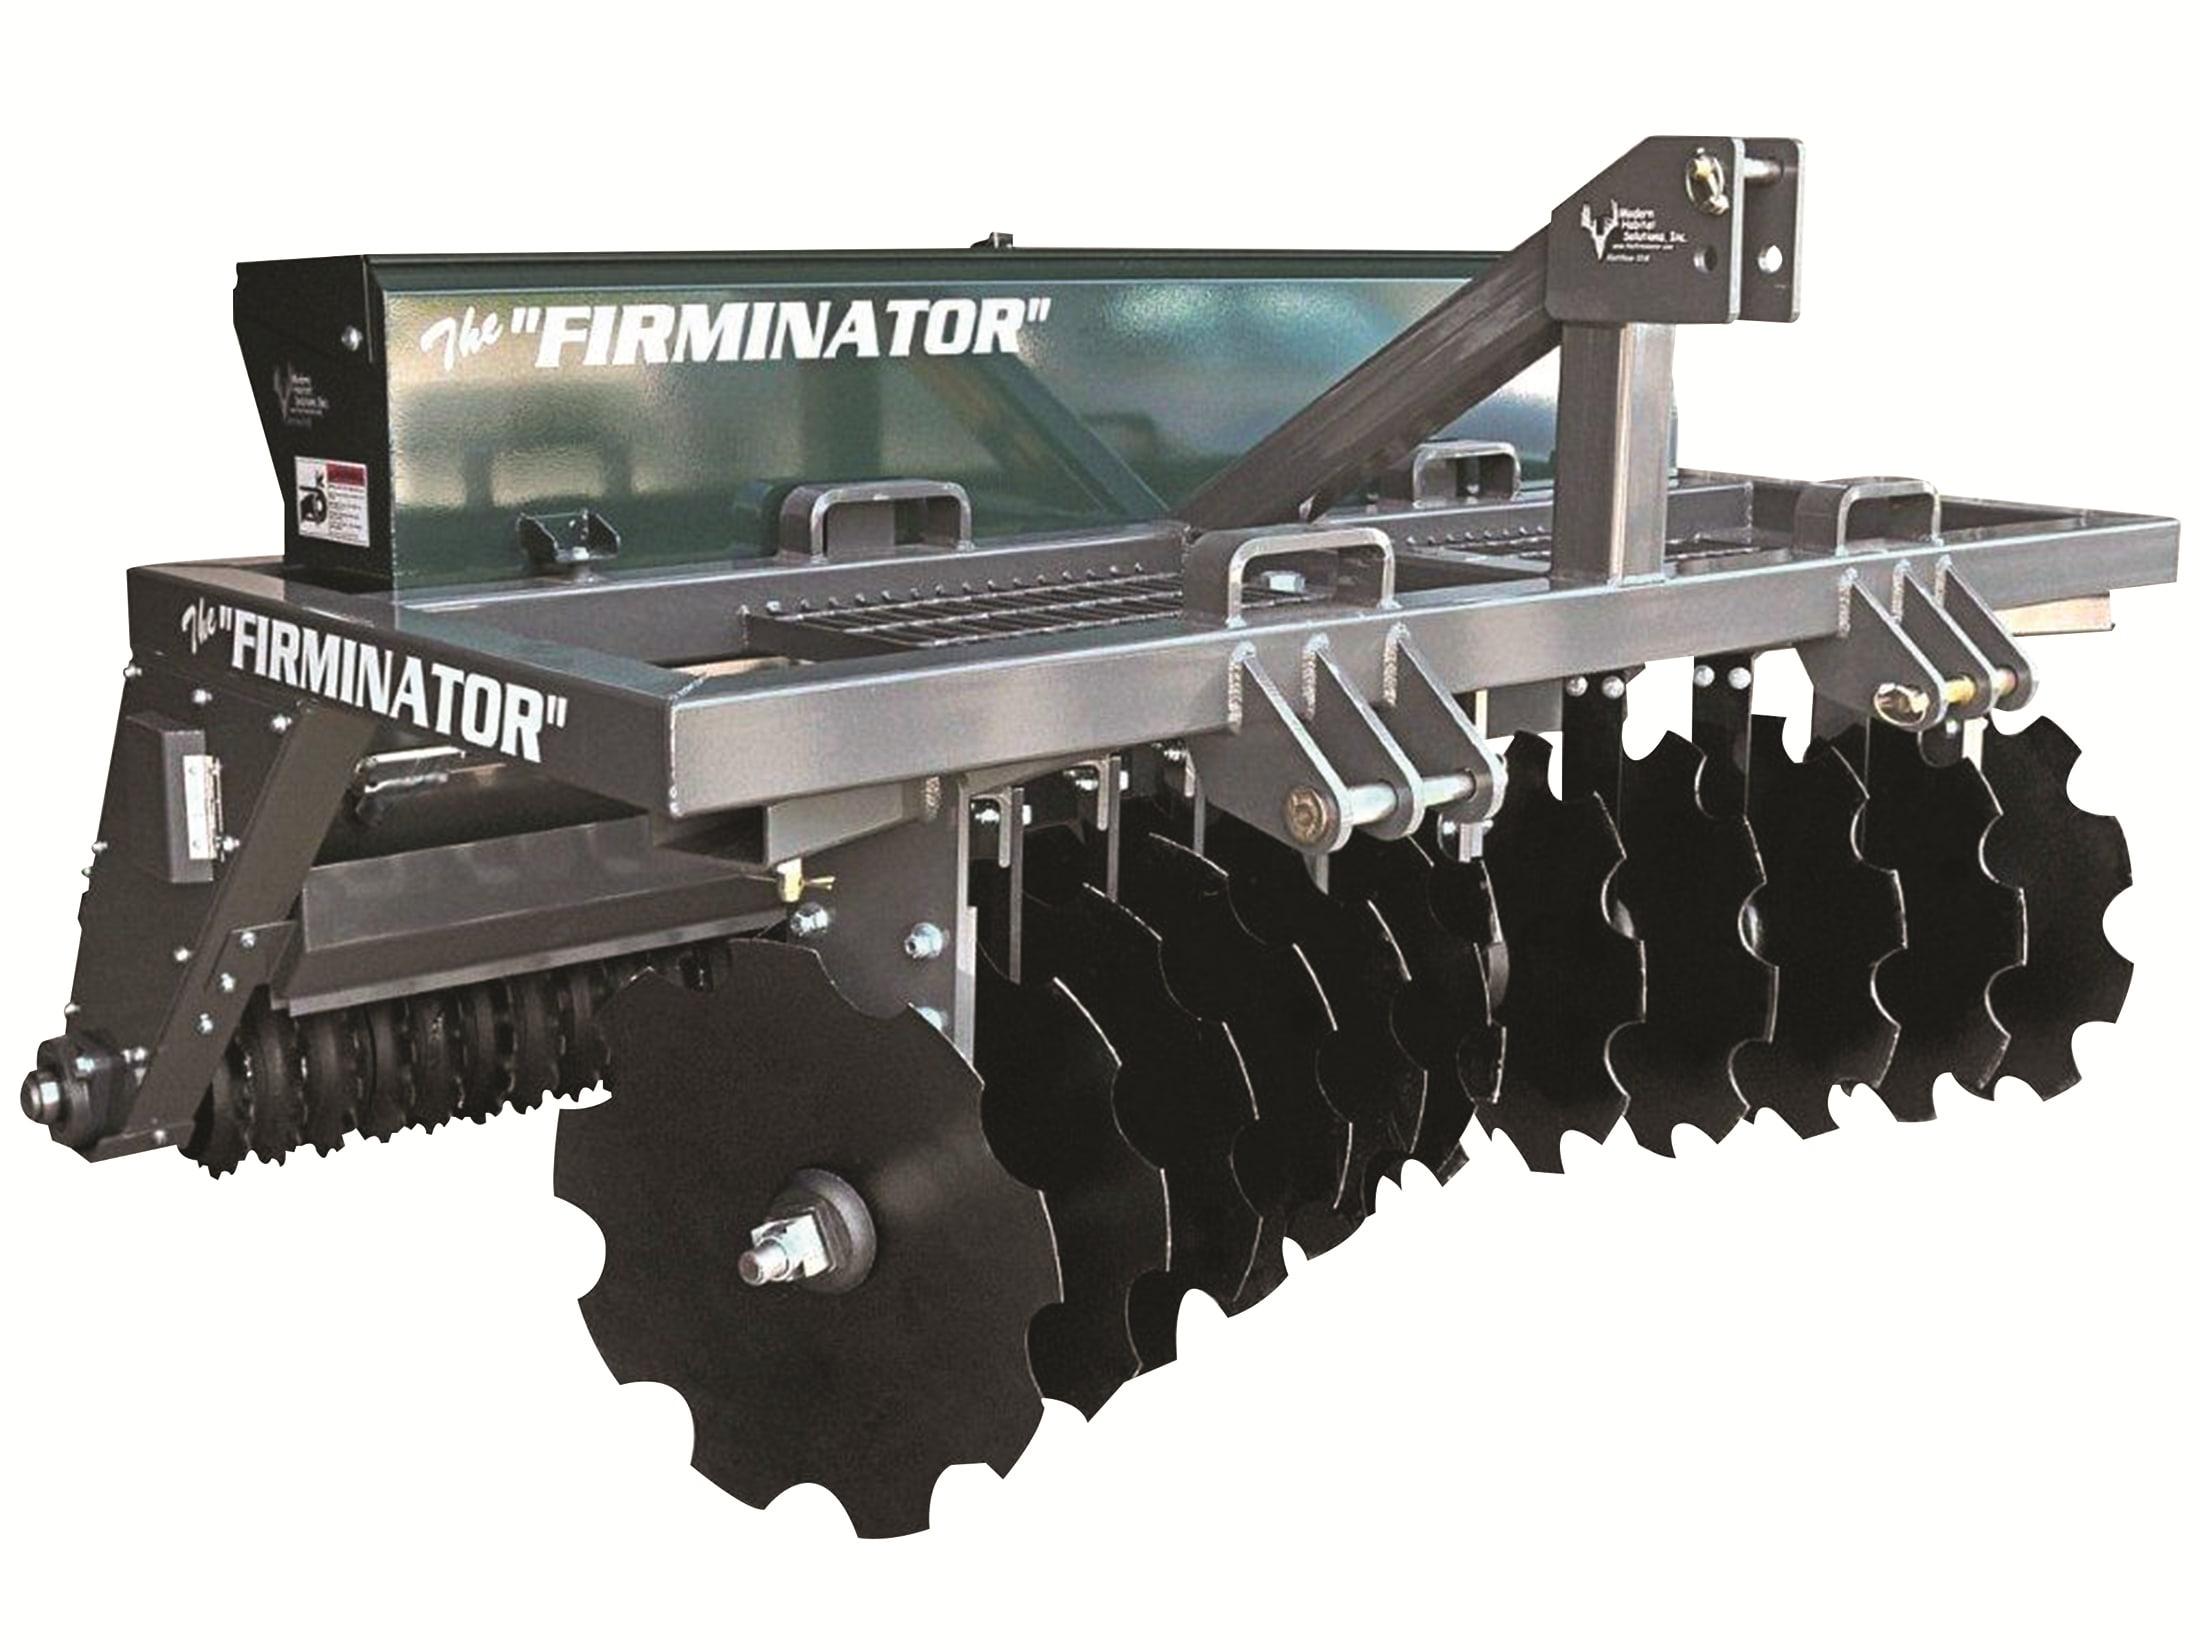 Ranew S Outdoor Equipment 4 Firminator G 3 Food Plot Implement 9